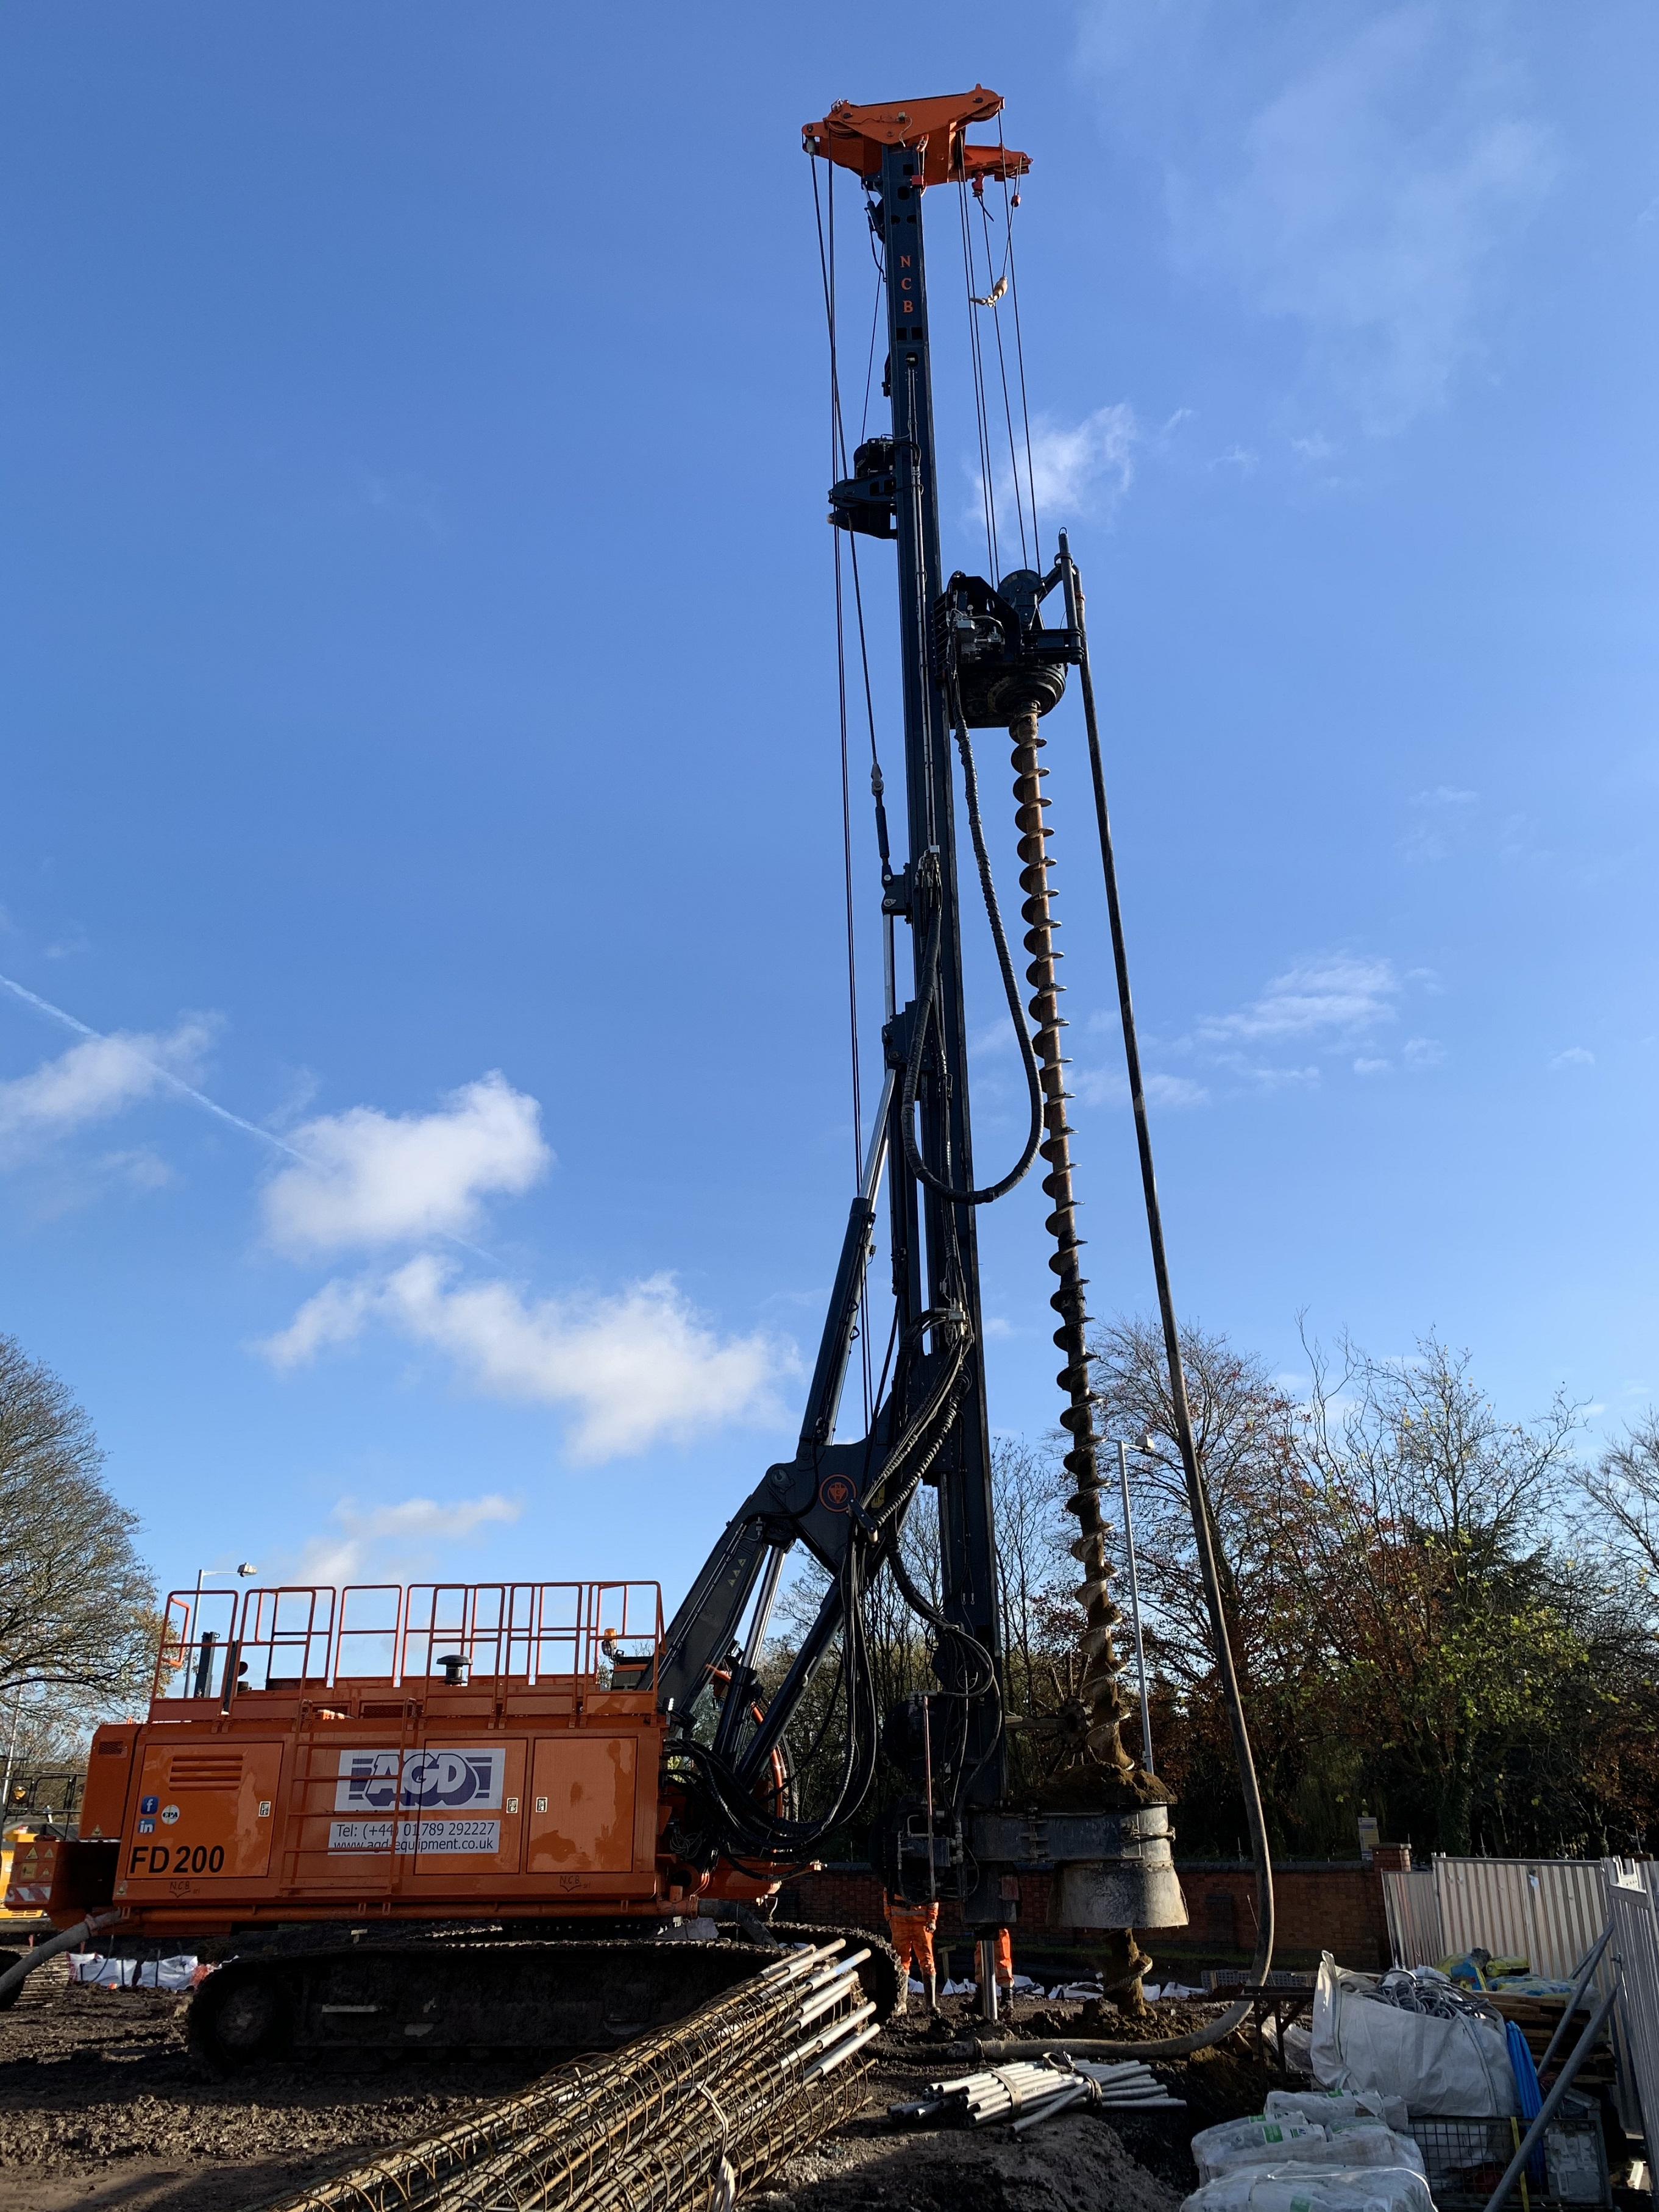 NCB FD200 CFA piling rig at Wolverhampton